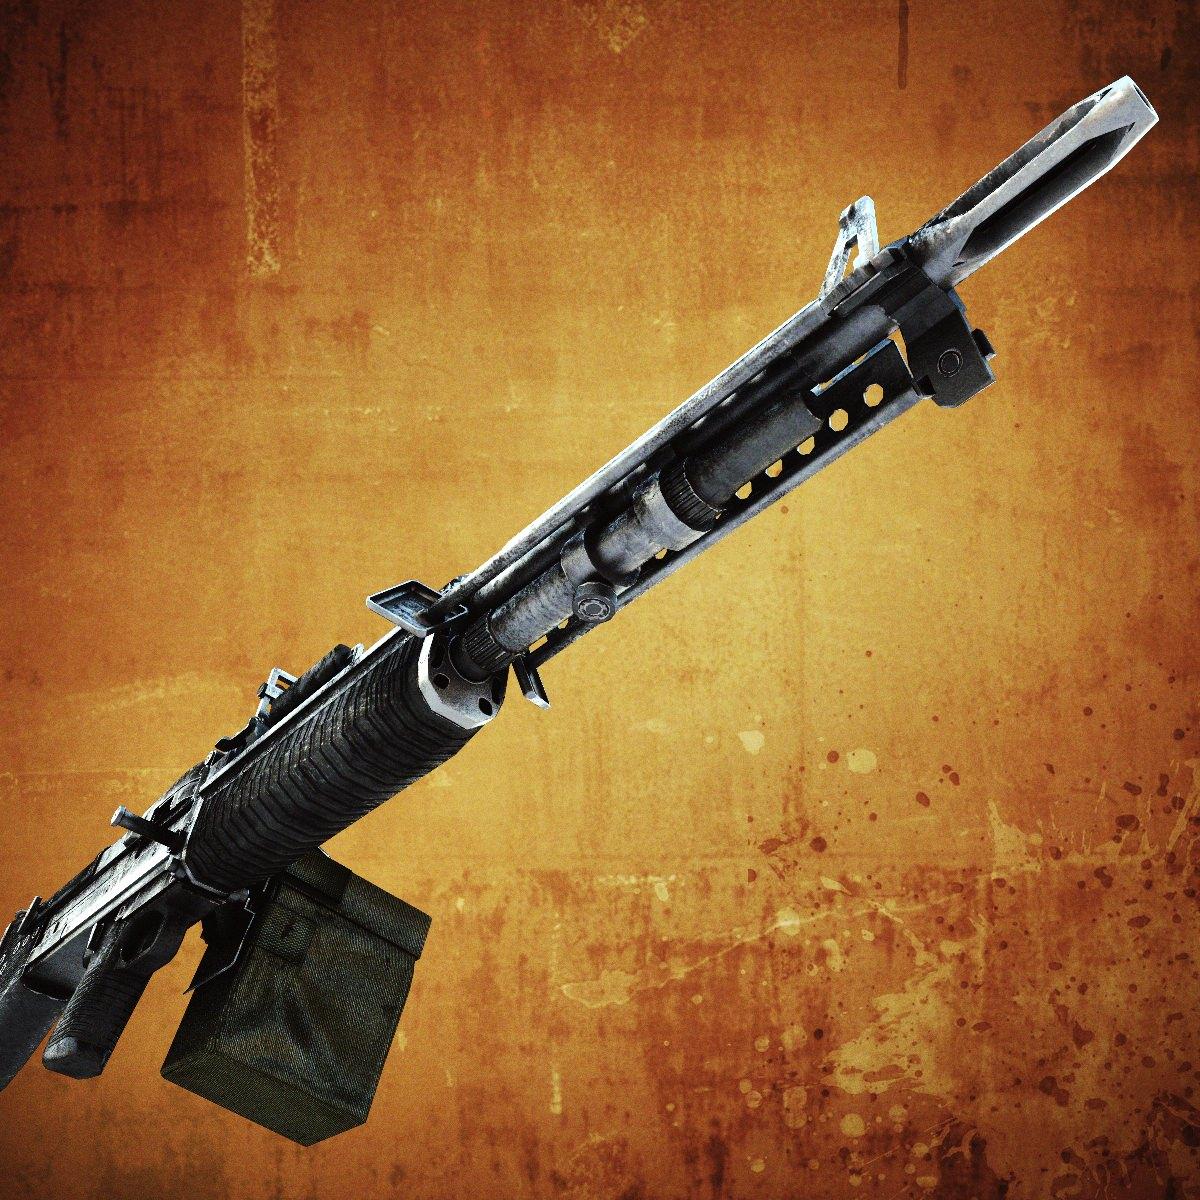 m60 machine gun - photo #31